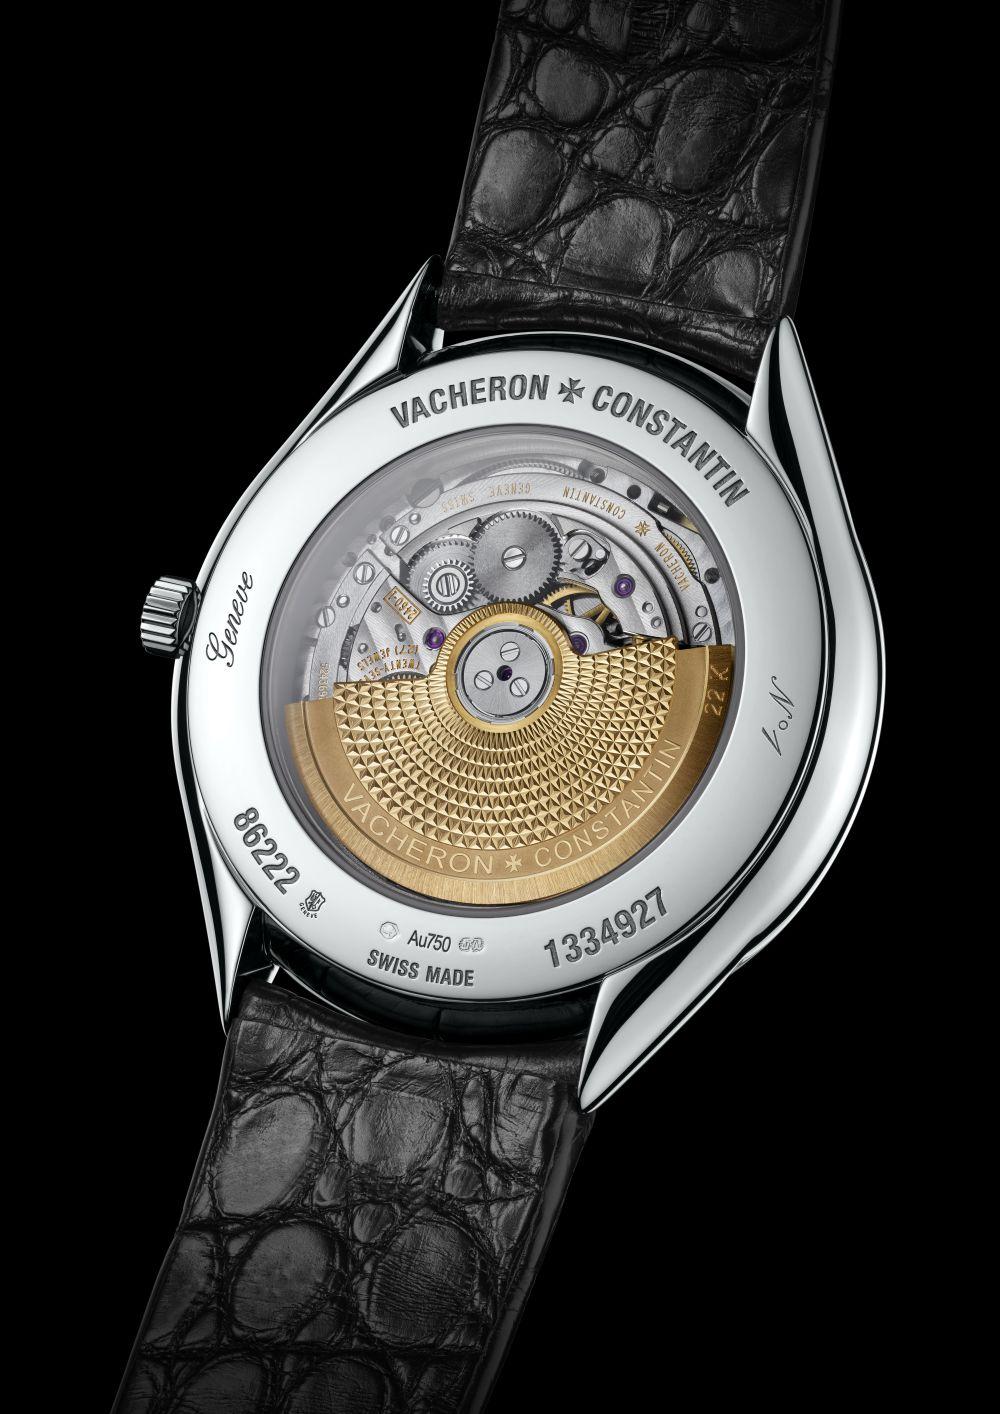 Vacheron-Constantin-Metiers-dArt-Villes-Lumieres-86222-000g-b101-v-1446474.jpg